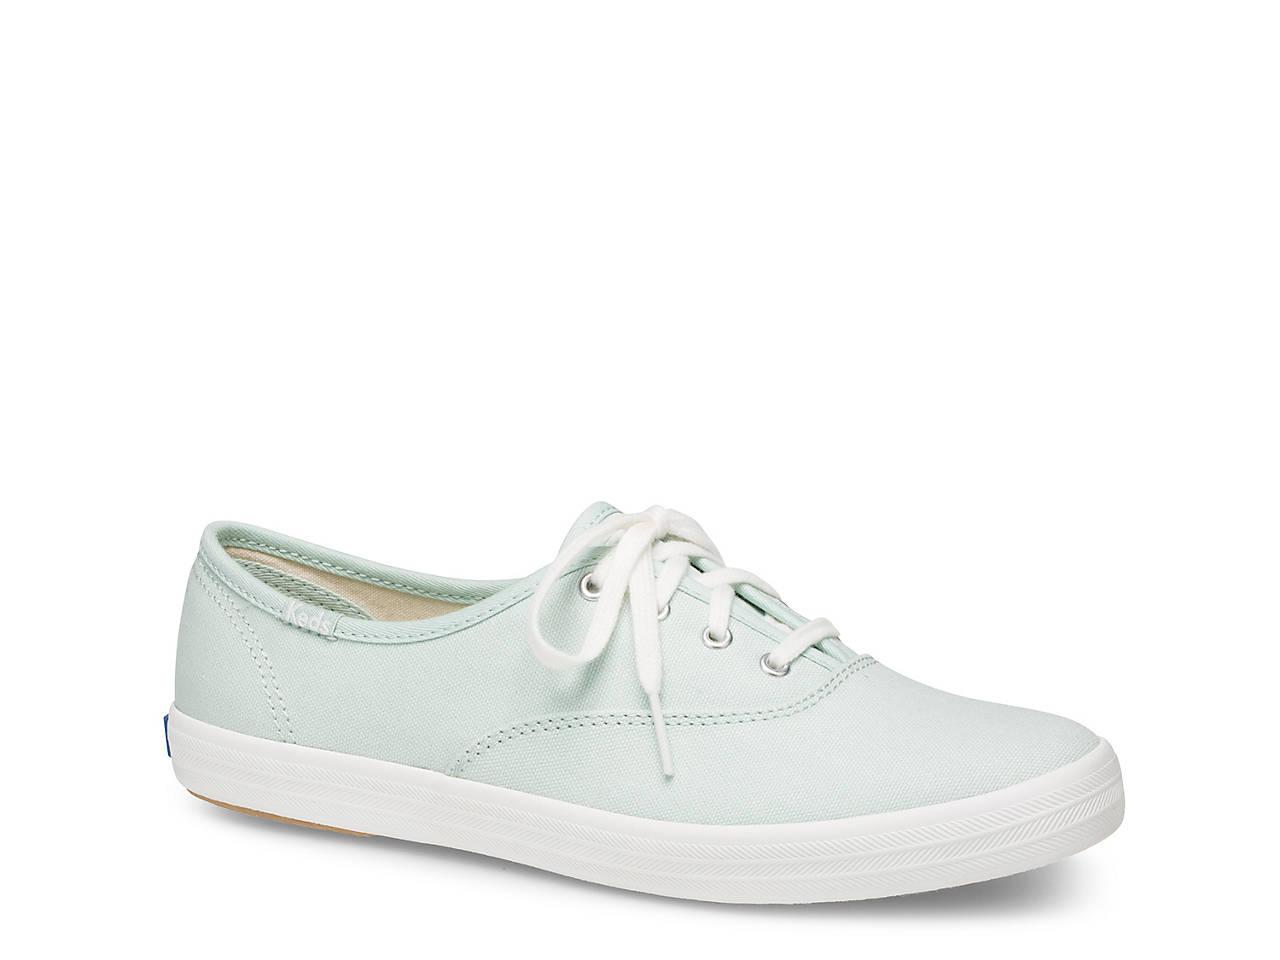 f114d9a45fcb2 Keds Champion Sneaker - Women s Women s Shoes